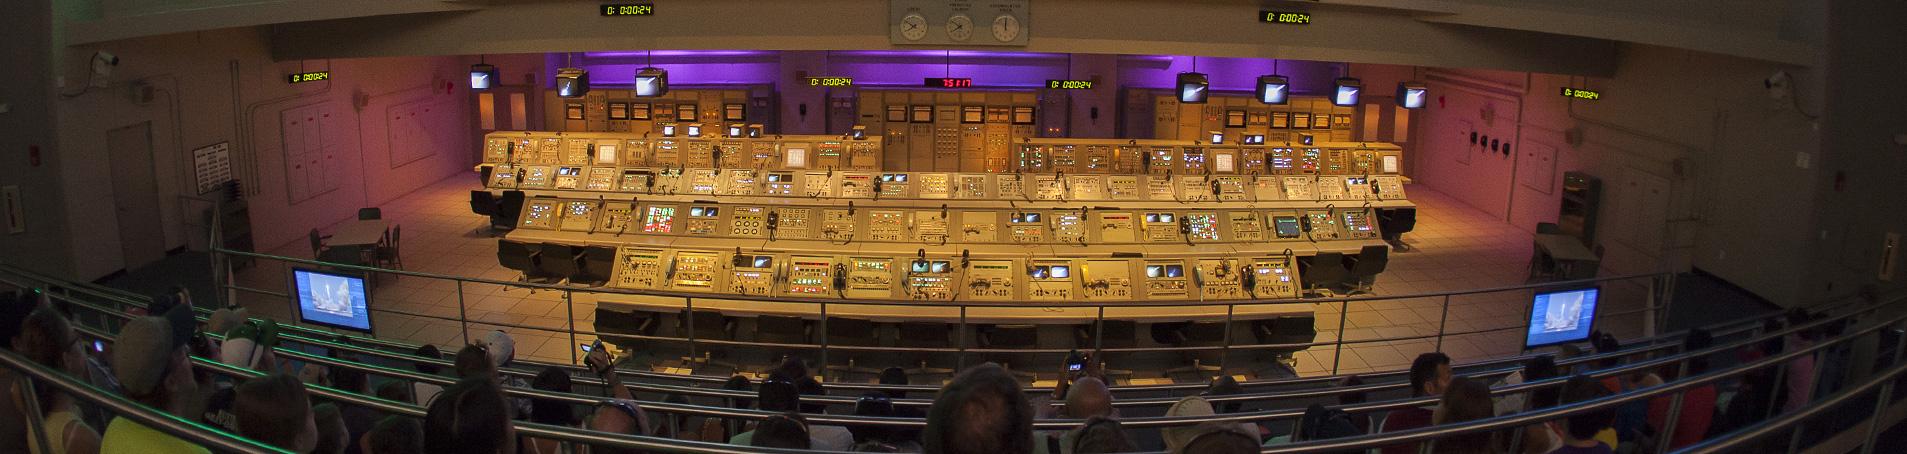 Apollo_Saturn_V_Center_Apollo_Consoles-hero.jpg